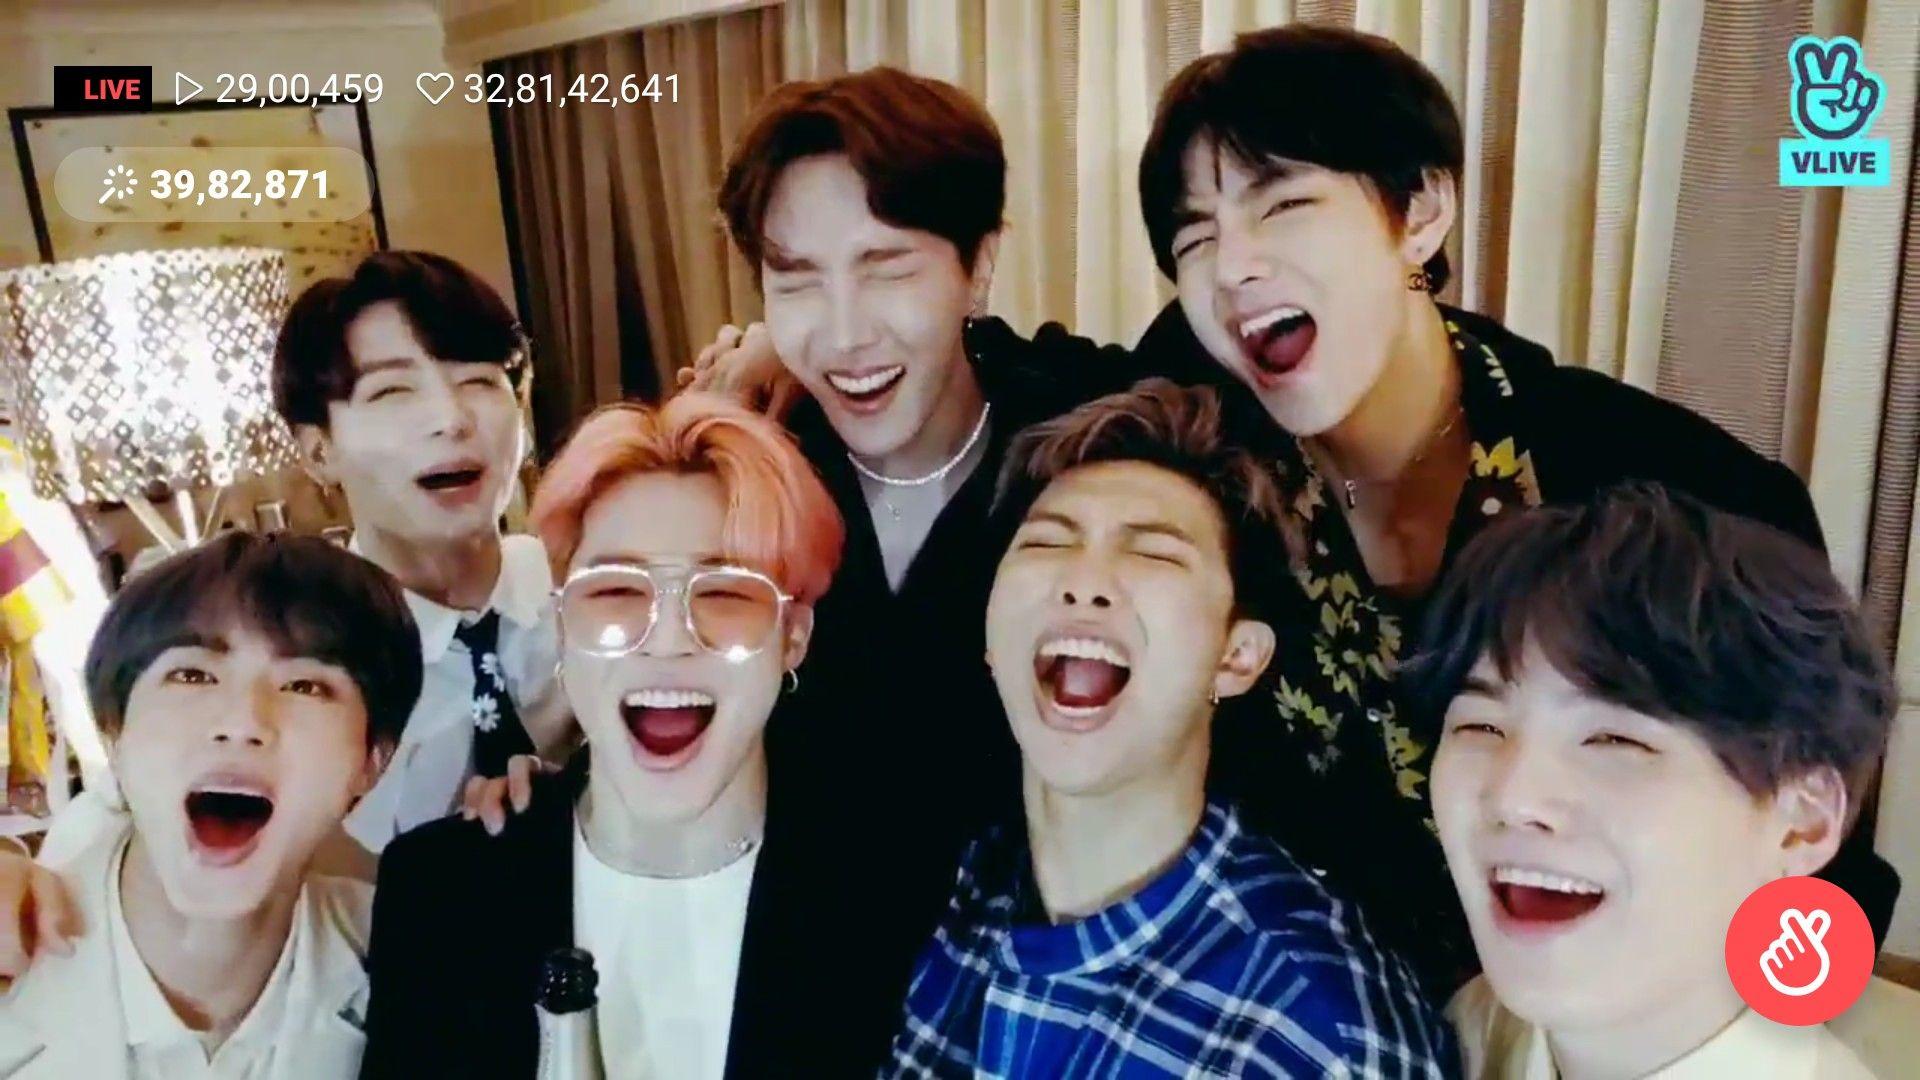 BBMA'S 2019 BTS WON THE AWARDS TOP SOCIAL ARTIST TOP DUO